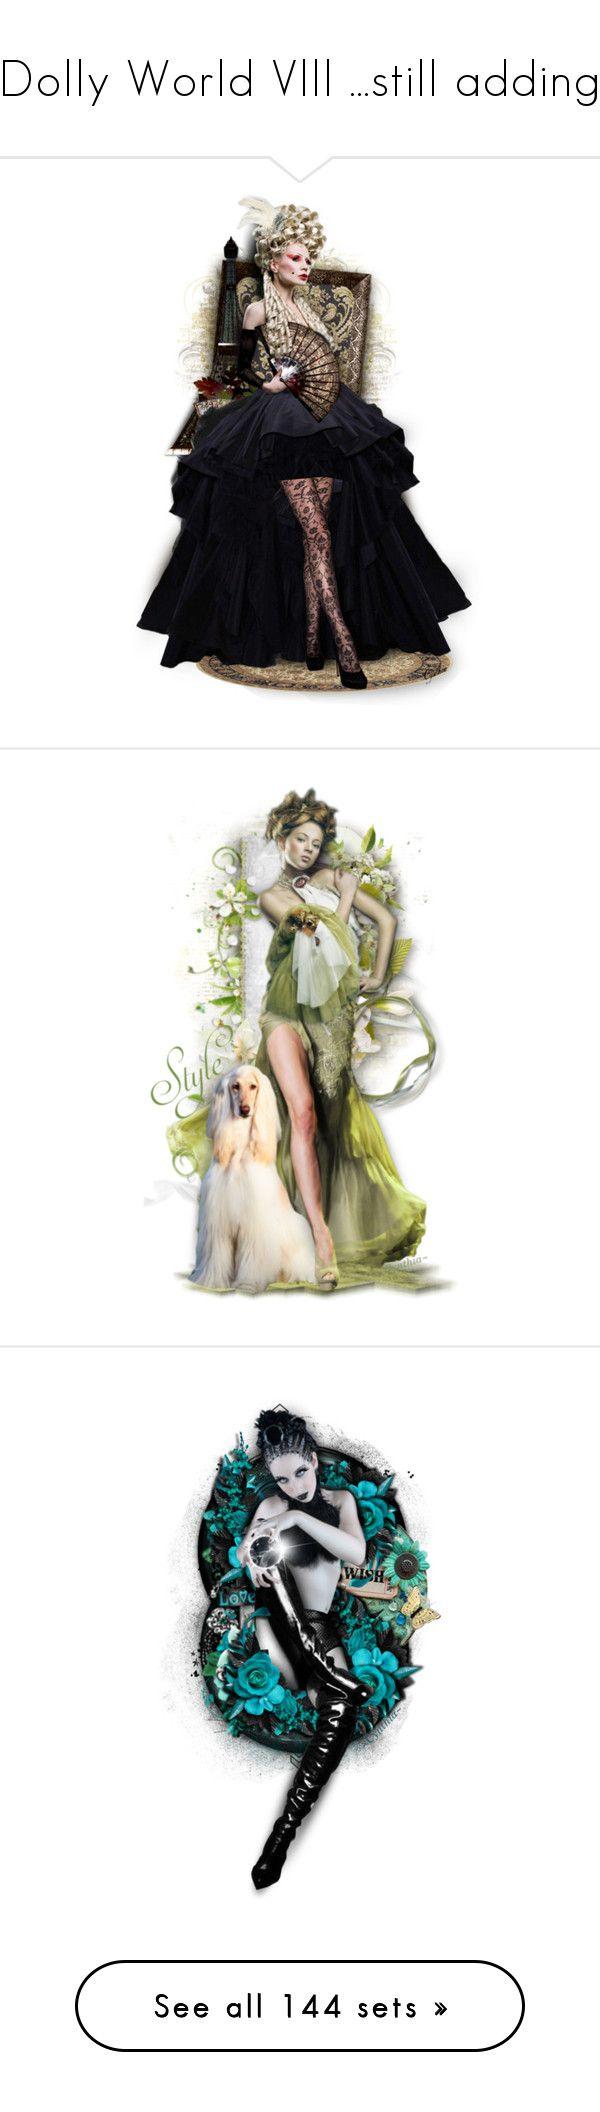 """Dolly World Vlll ...still adding"" by lovetodrinktea ❤ liked on Polyvore featuring art, vintage, doll, Flowers, blackandwhite, dolls, dollset, artexpression, dollart and aqua"